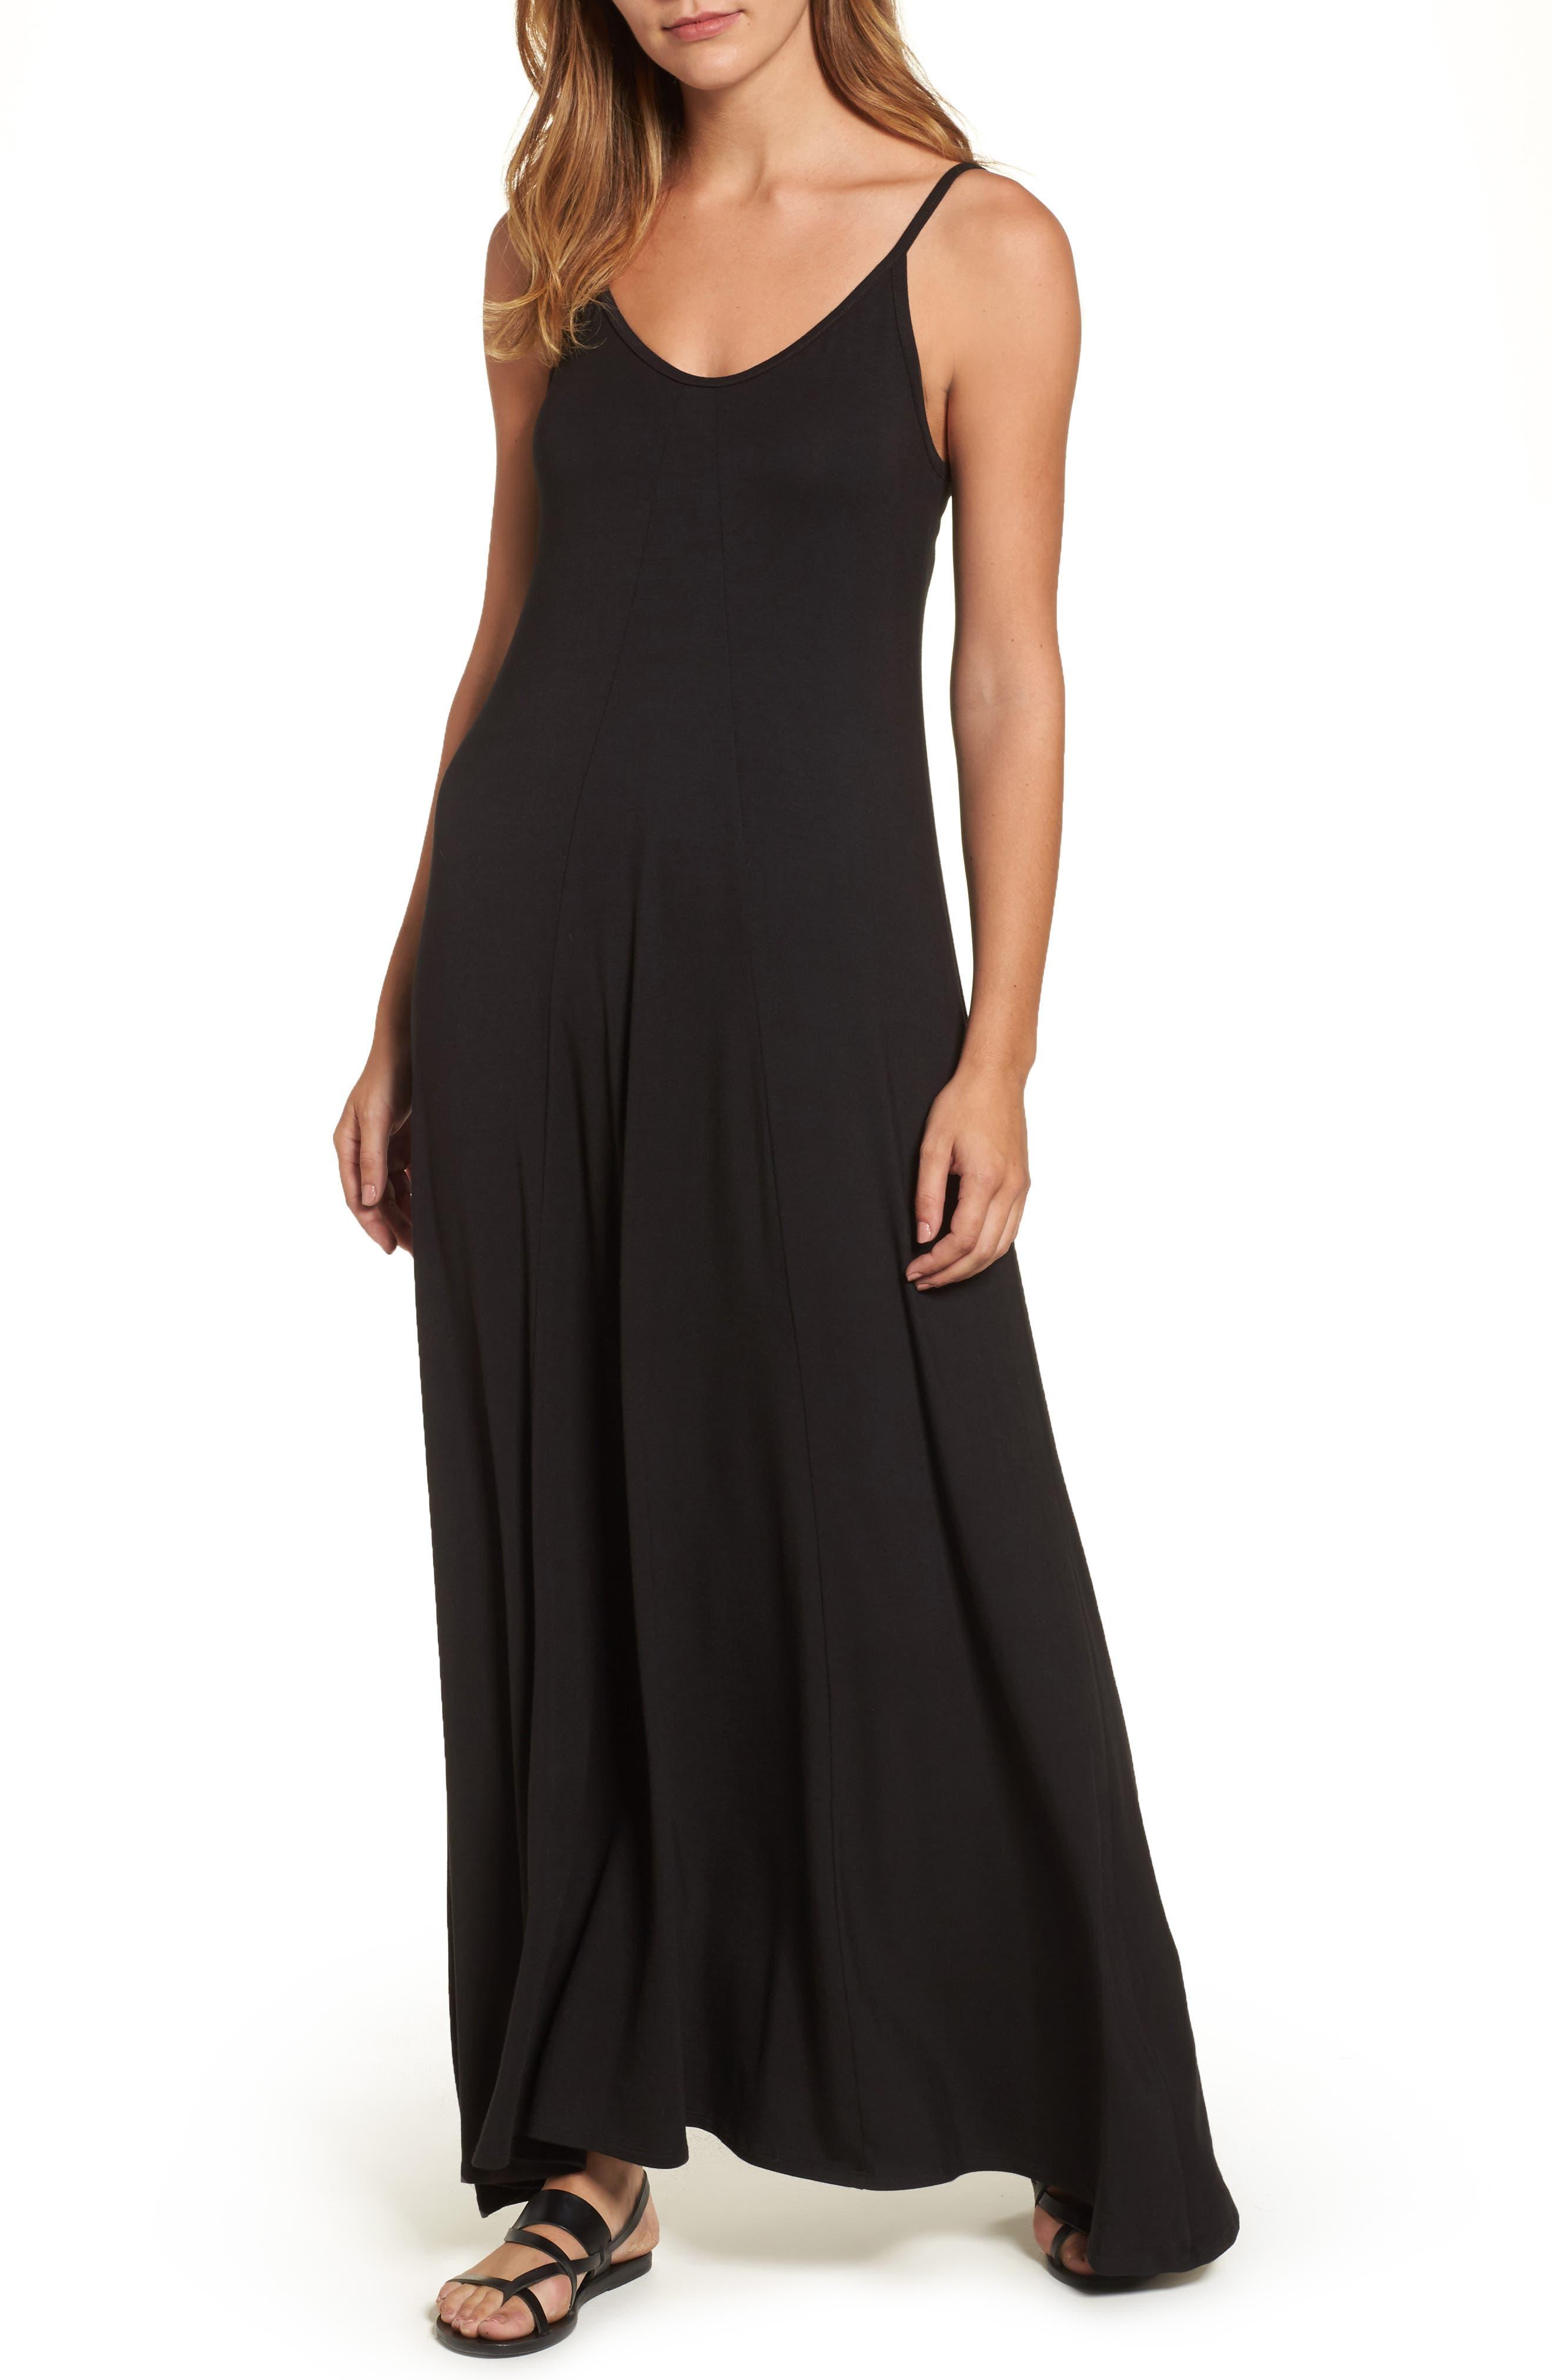 LOVEAPPELLA Knit Maxi Dress, Main, color, BLACK